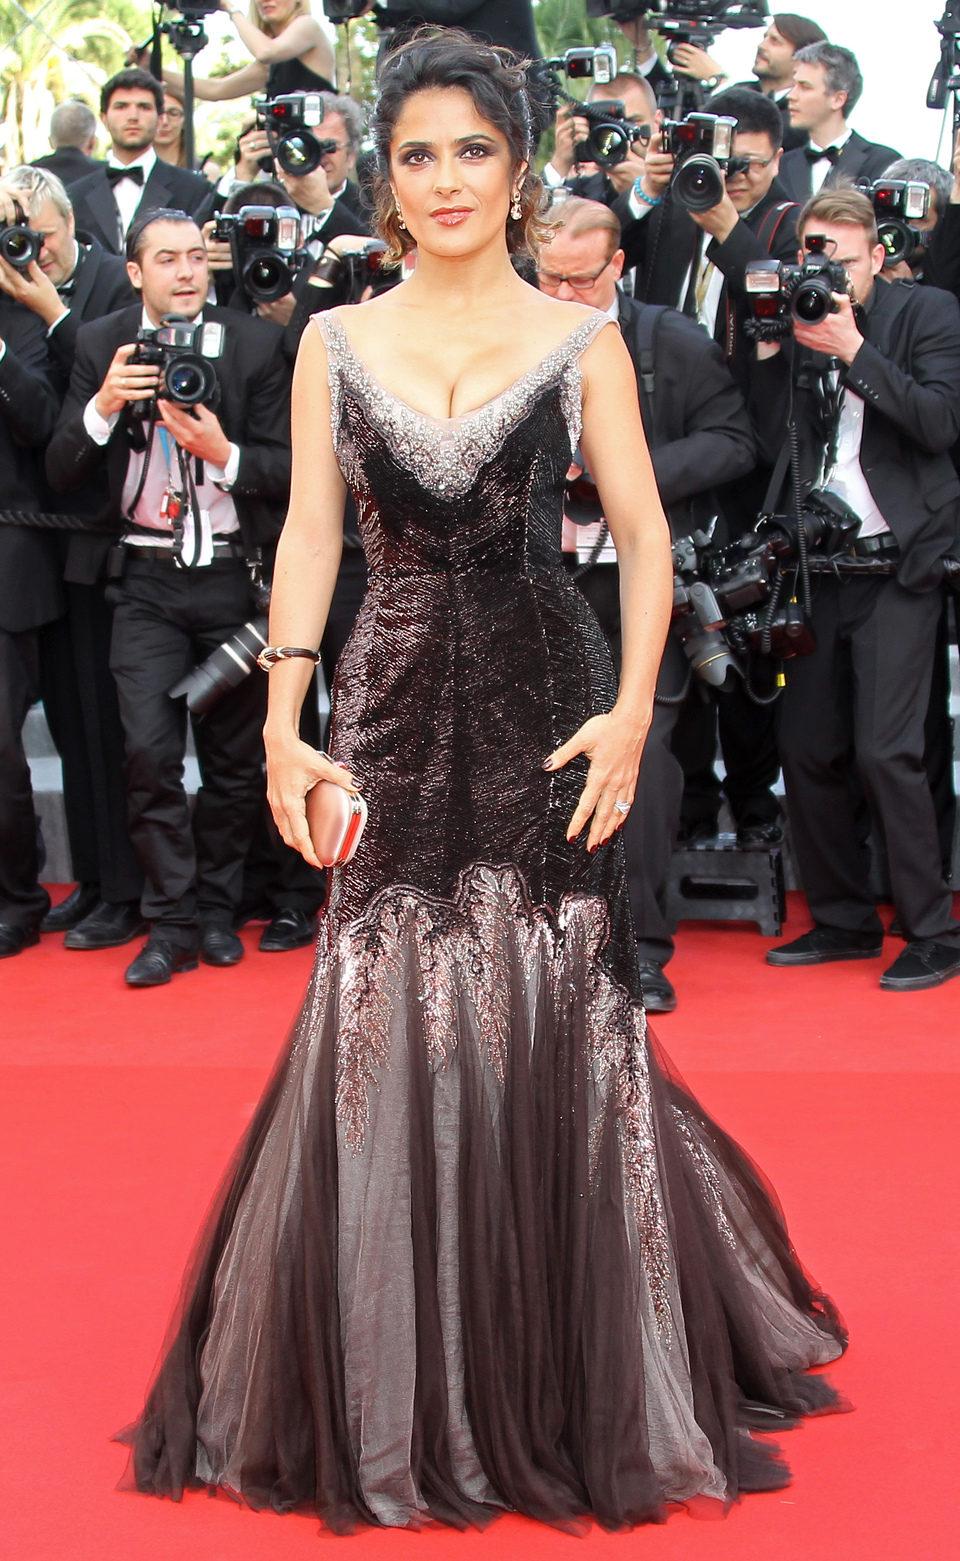 Salma Hayek en el Festival de Cannes 2012